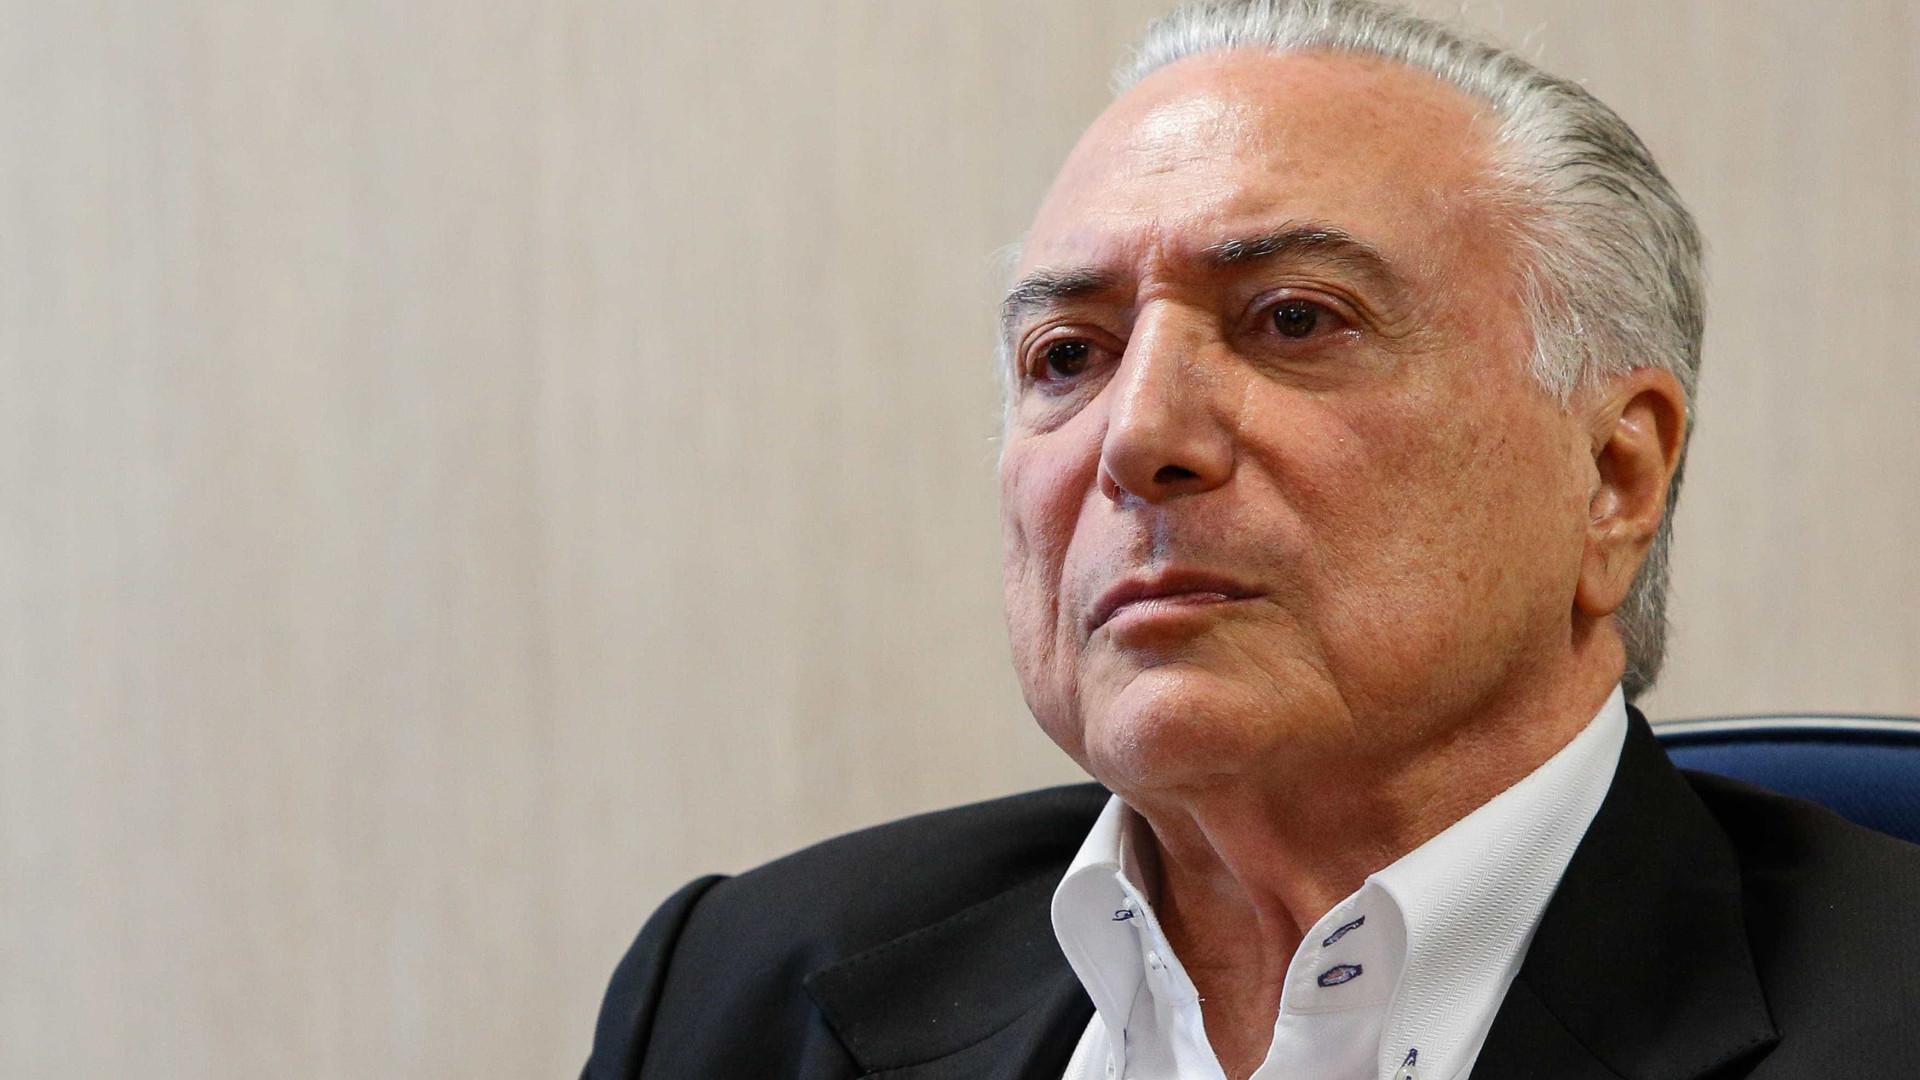 Dodge denuncia Temer no inquérito sobre desvios no setor de Portos